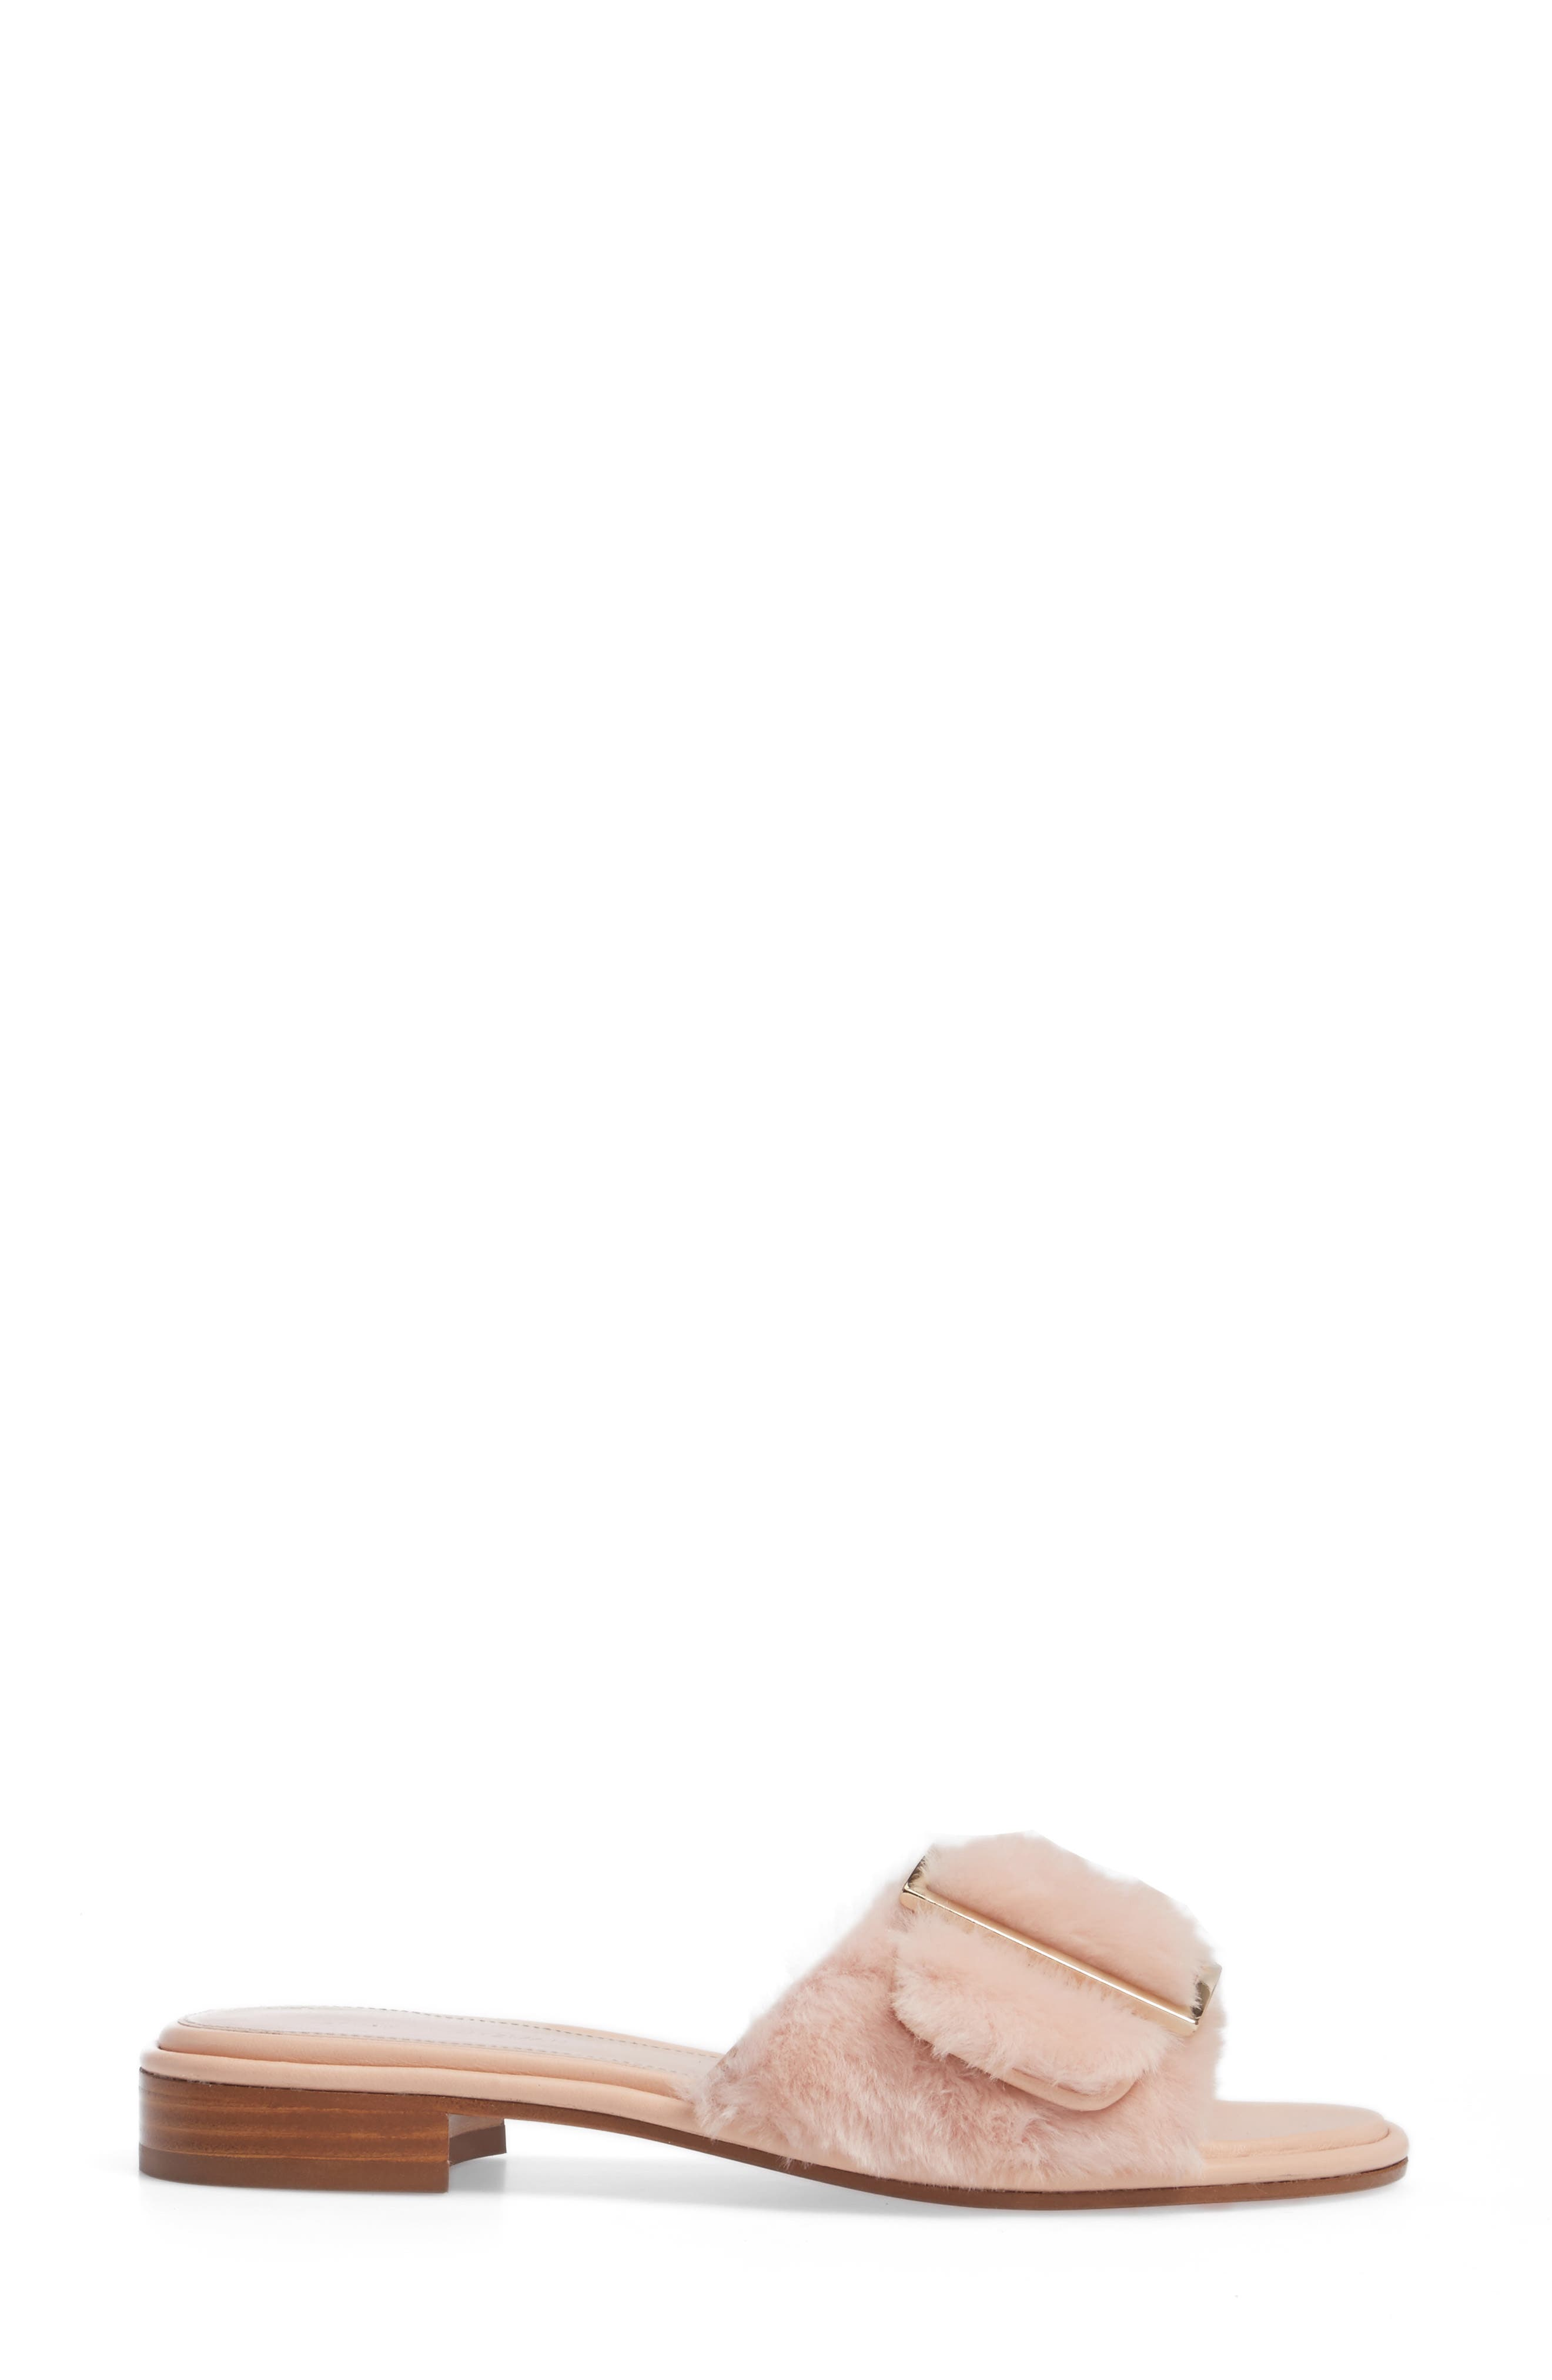 Fuzzywuz Genuine Shearling Slide Sandal,                             Alternate thumbnail 3, color,                             270